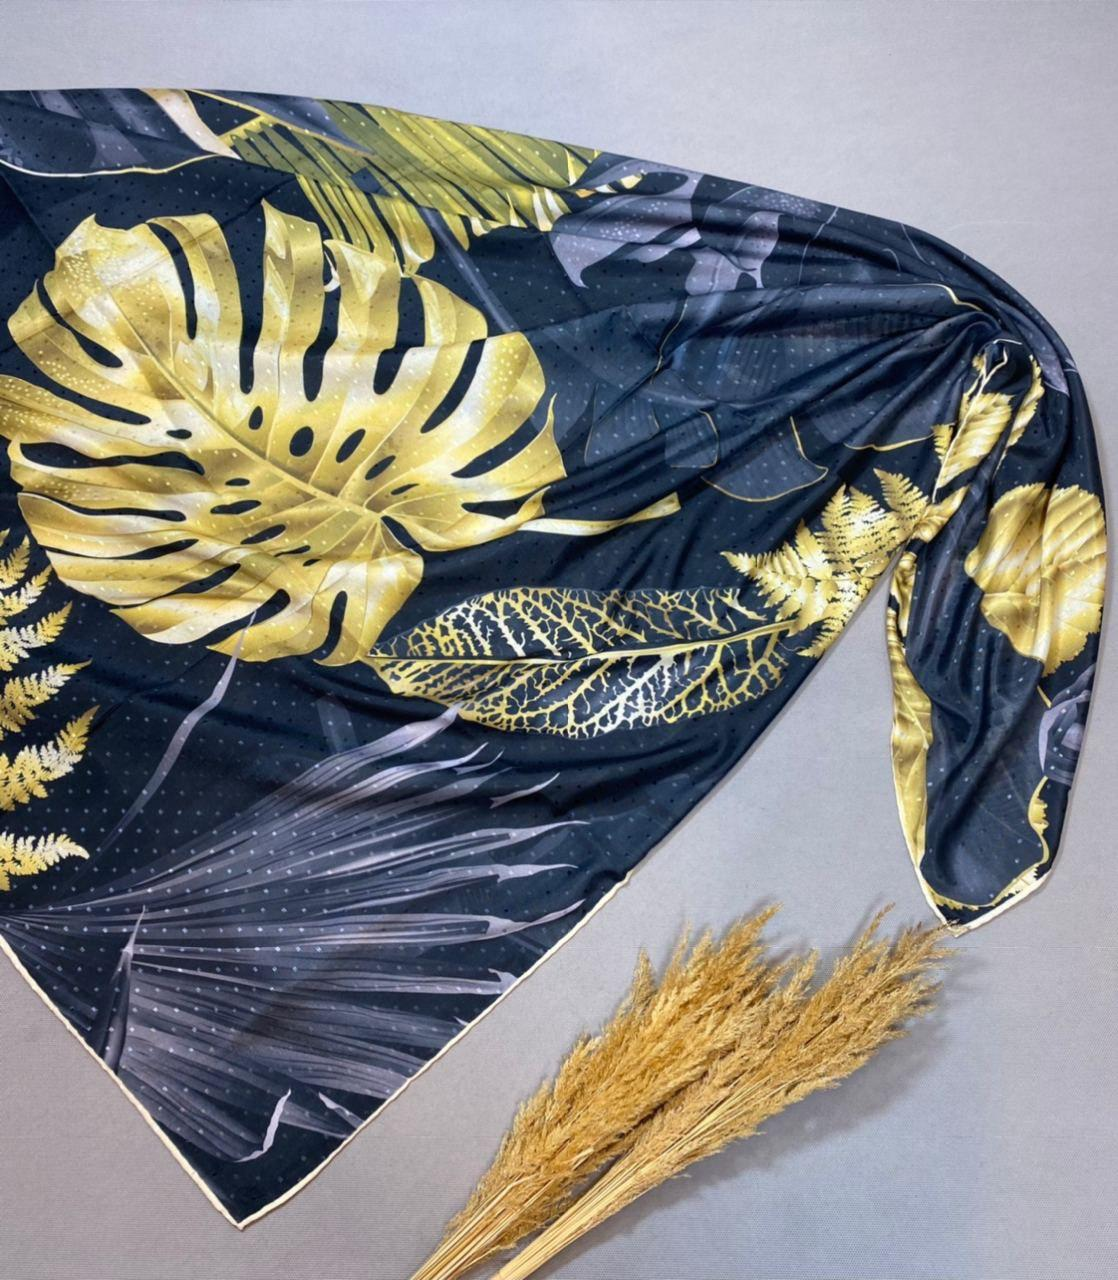 روسری حریر دیجیتالی